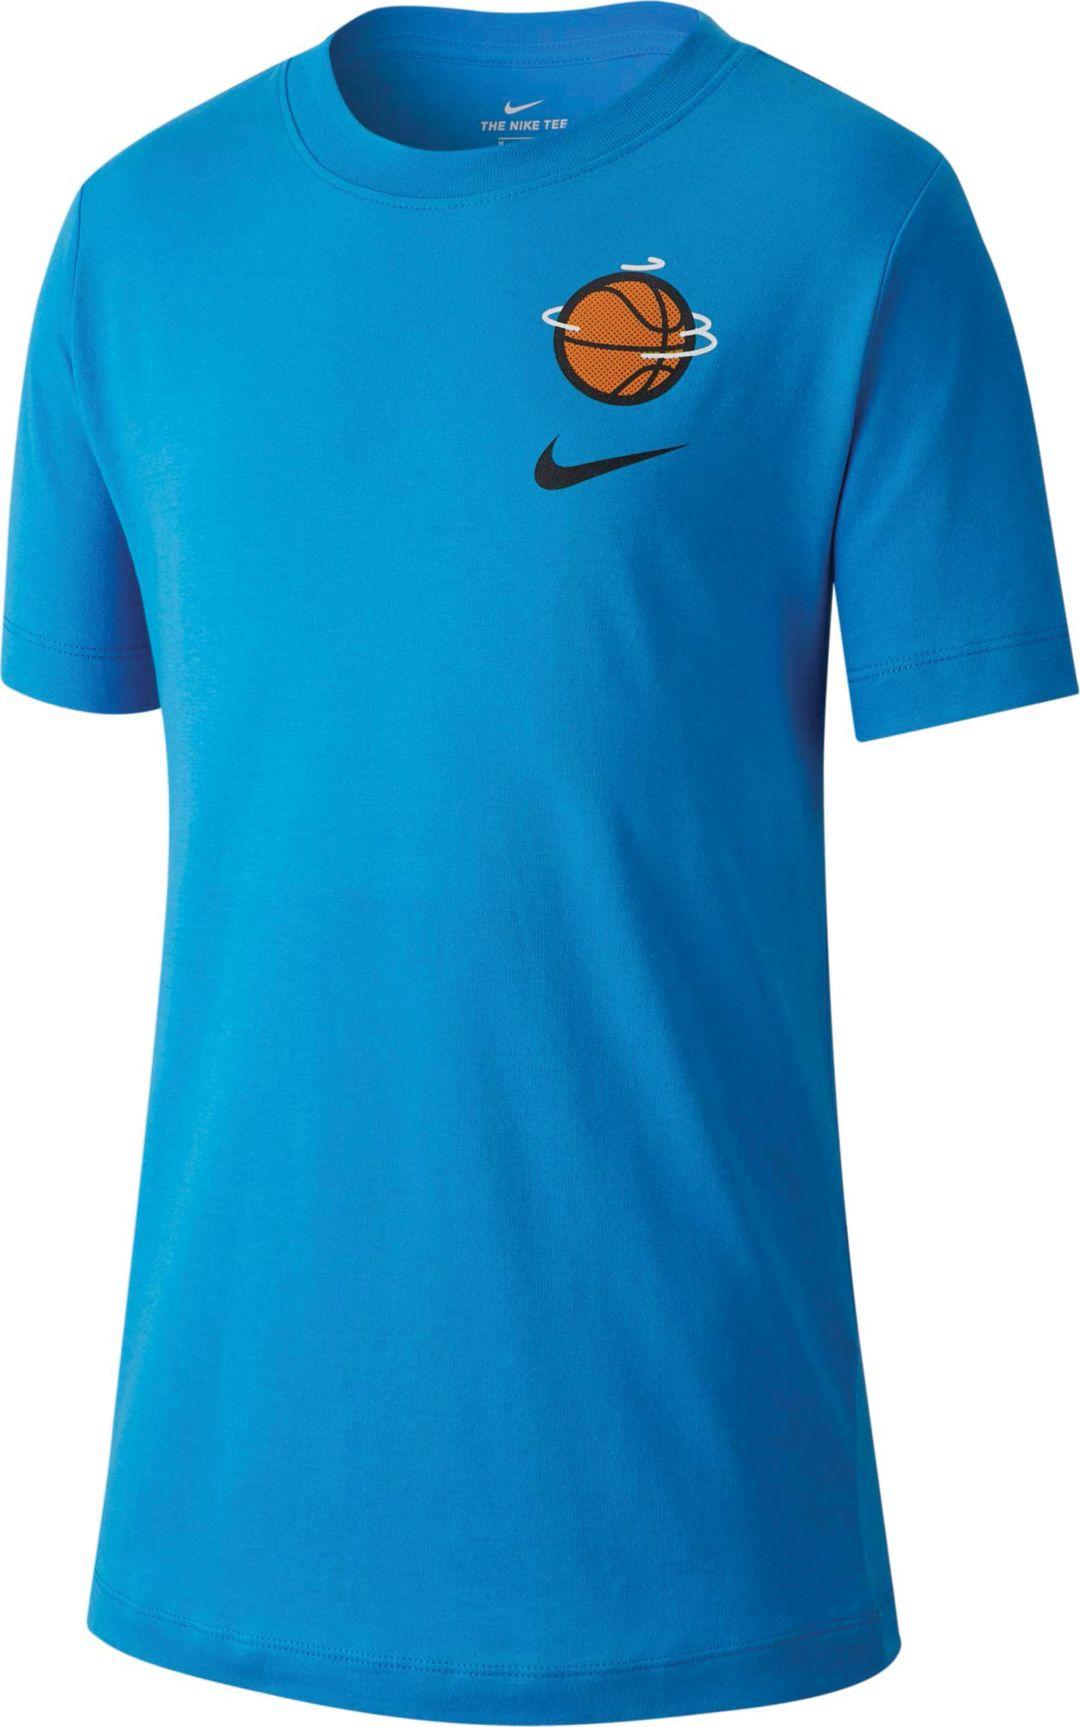 dc10937d7 Nike Boys' Sportswear Goat Basketball Graphic T-Shirt | DICK'S ...